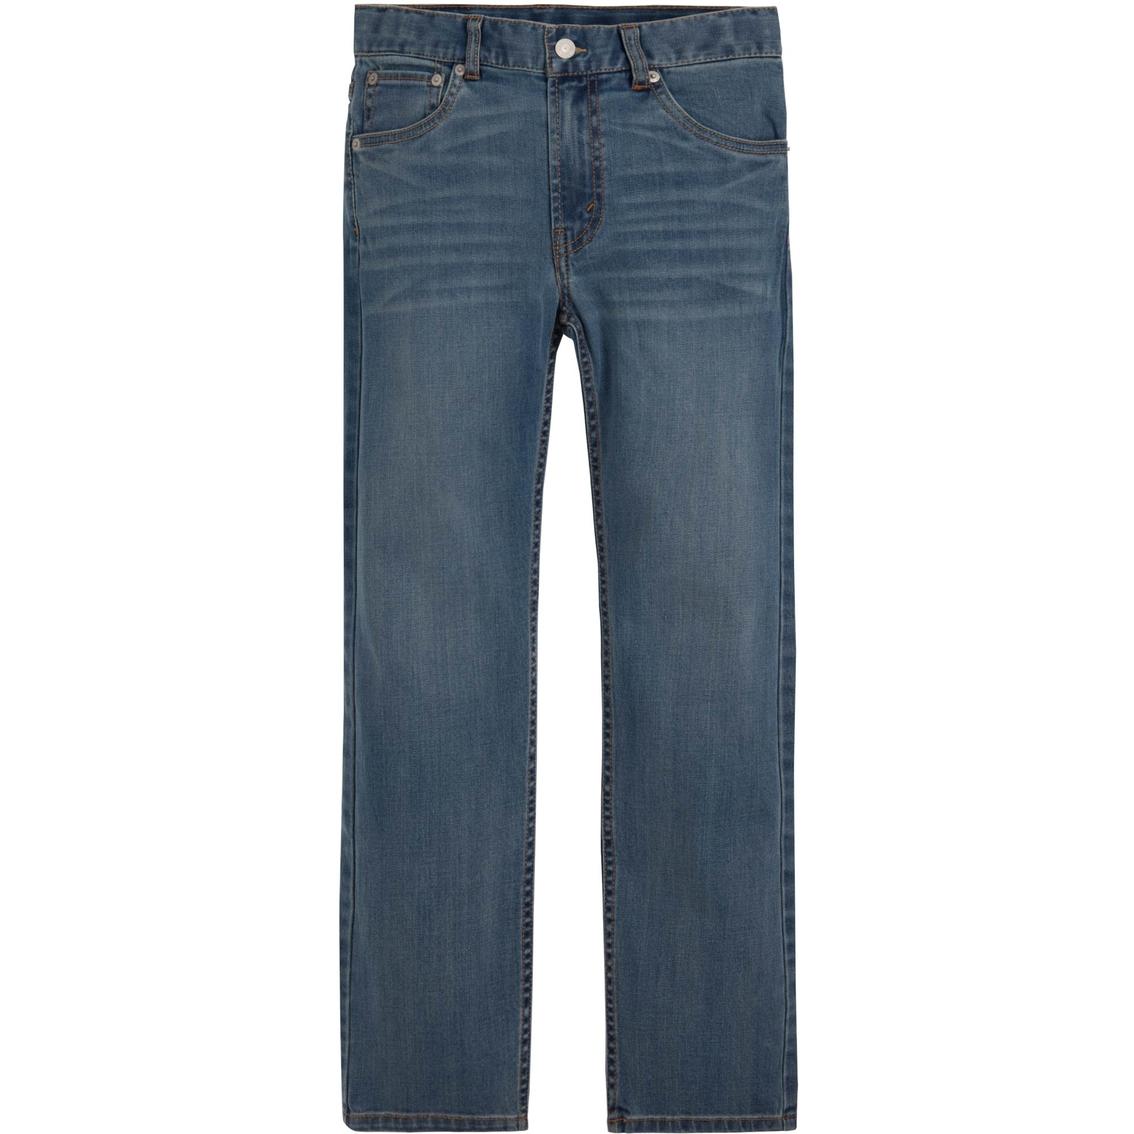 f587212c Levi's Boys 541 Athletic Fit Jeans | Boys 8-20 | Apparel | Shop The ...